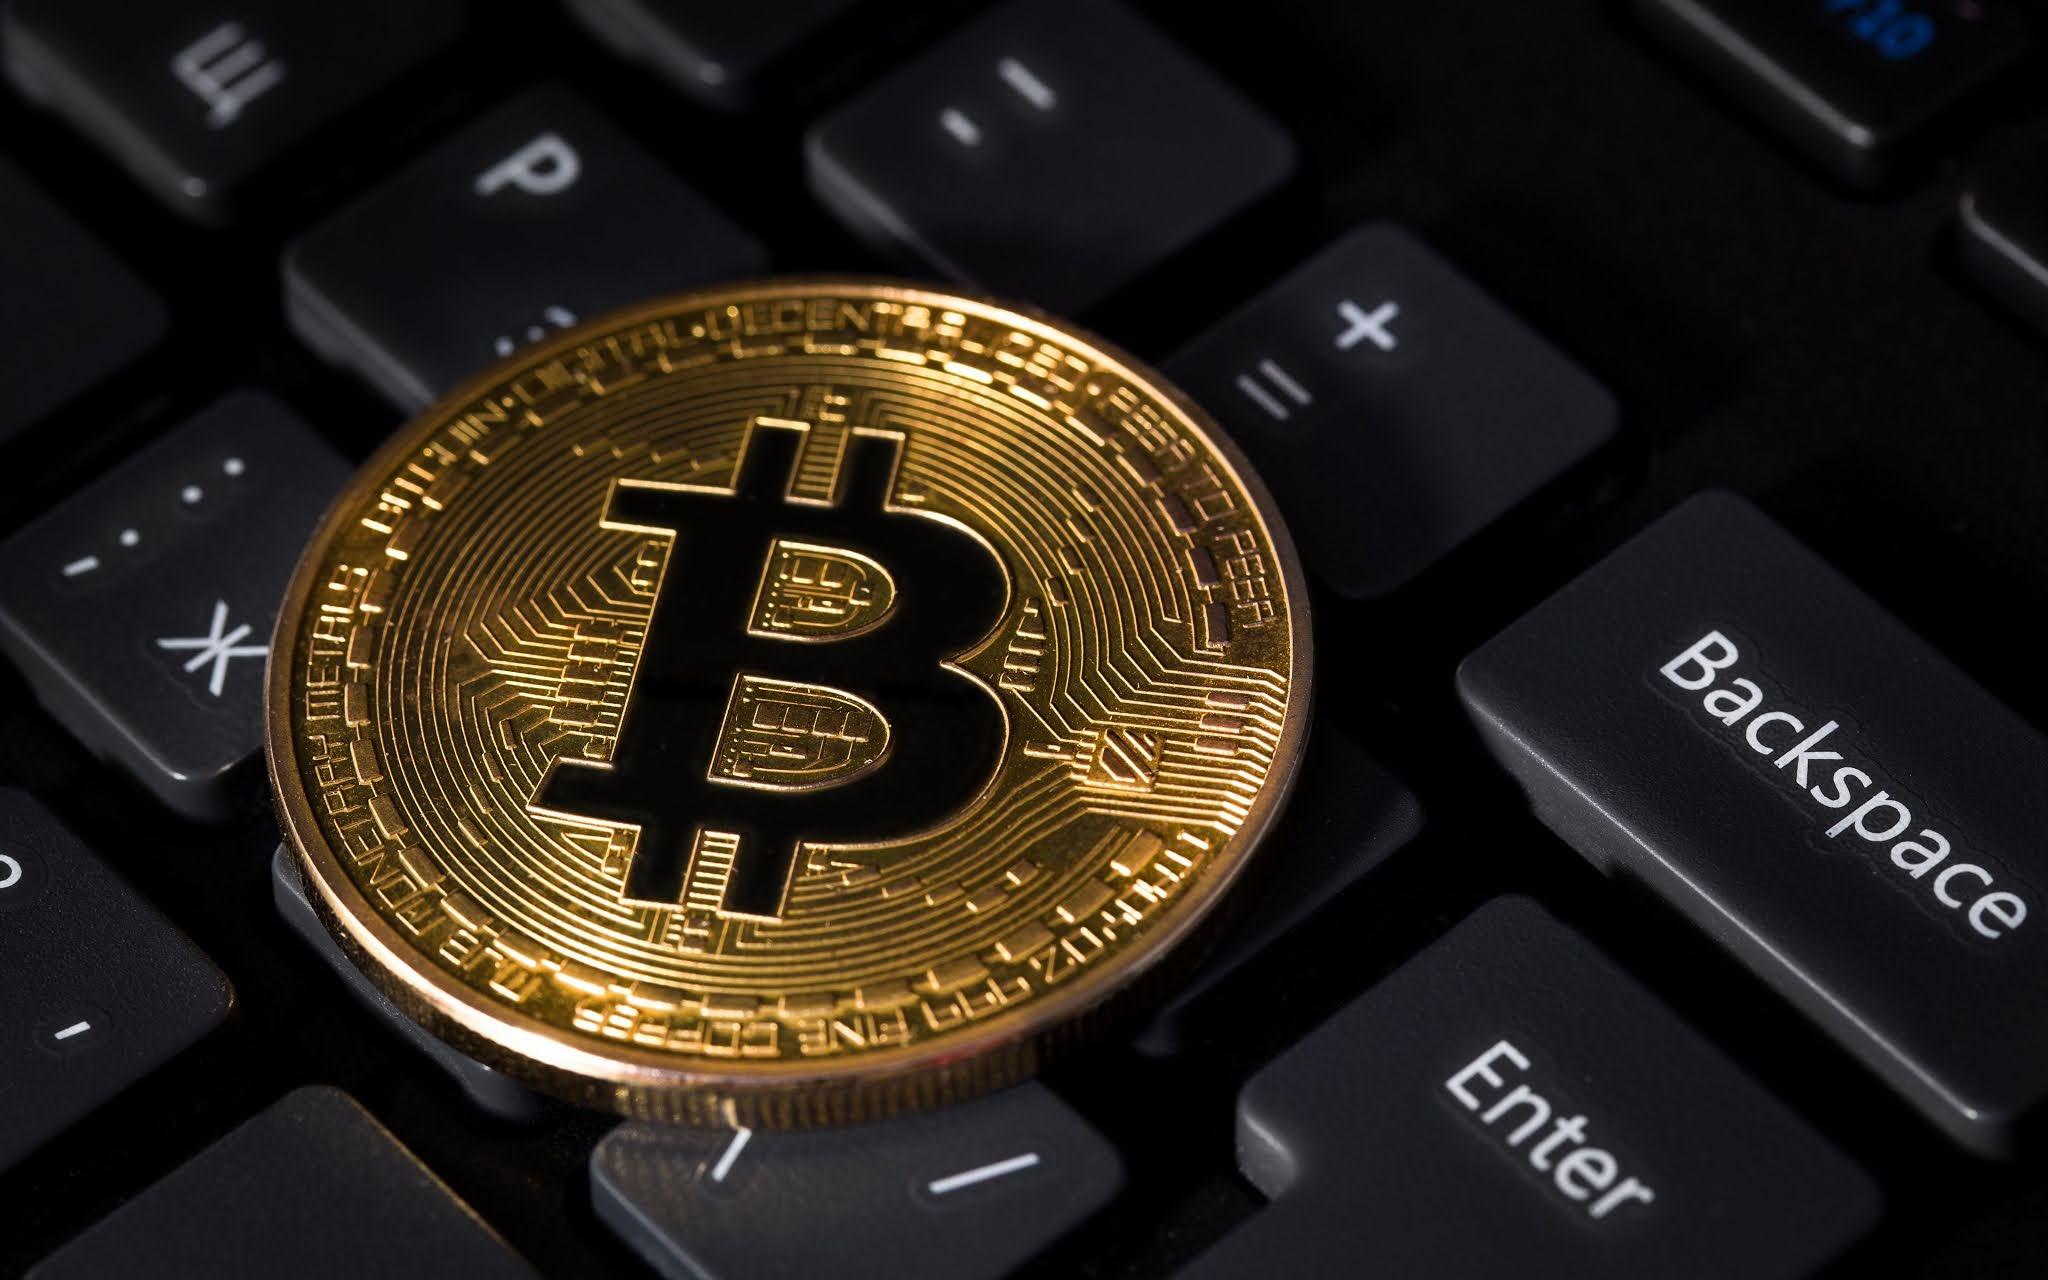 uložiti u bitcoin fnb ama bitcoin milijunaš